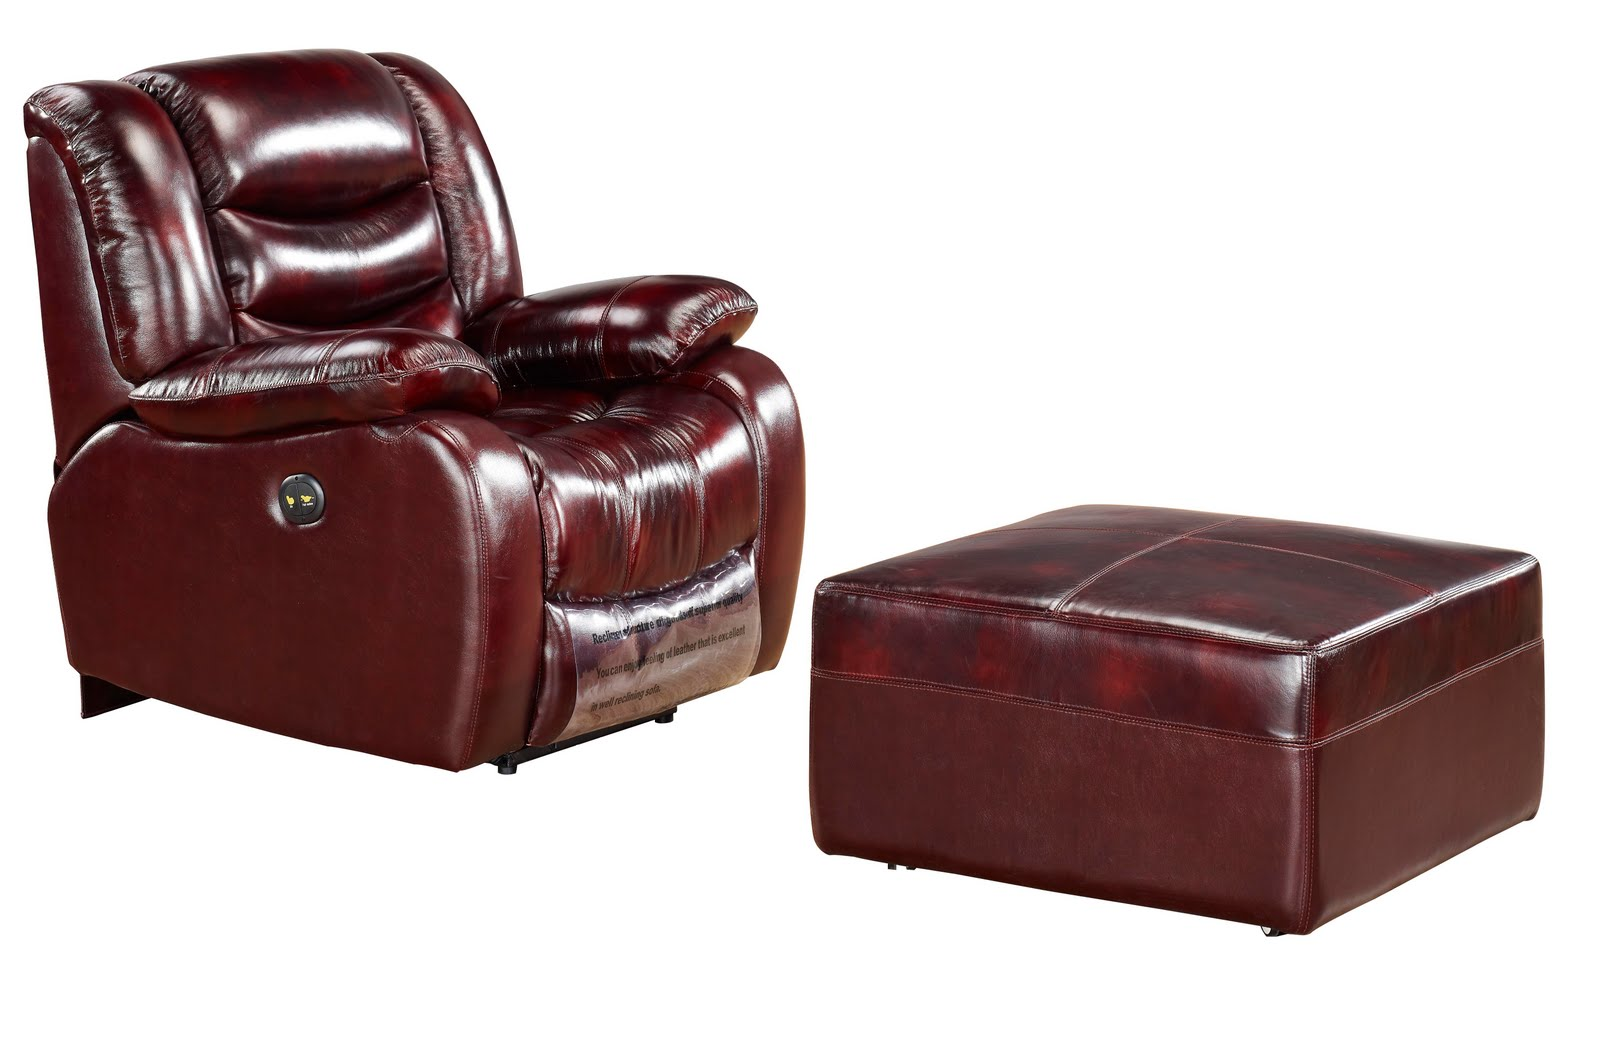 Dynasty Furniture Korea 01 29 11